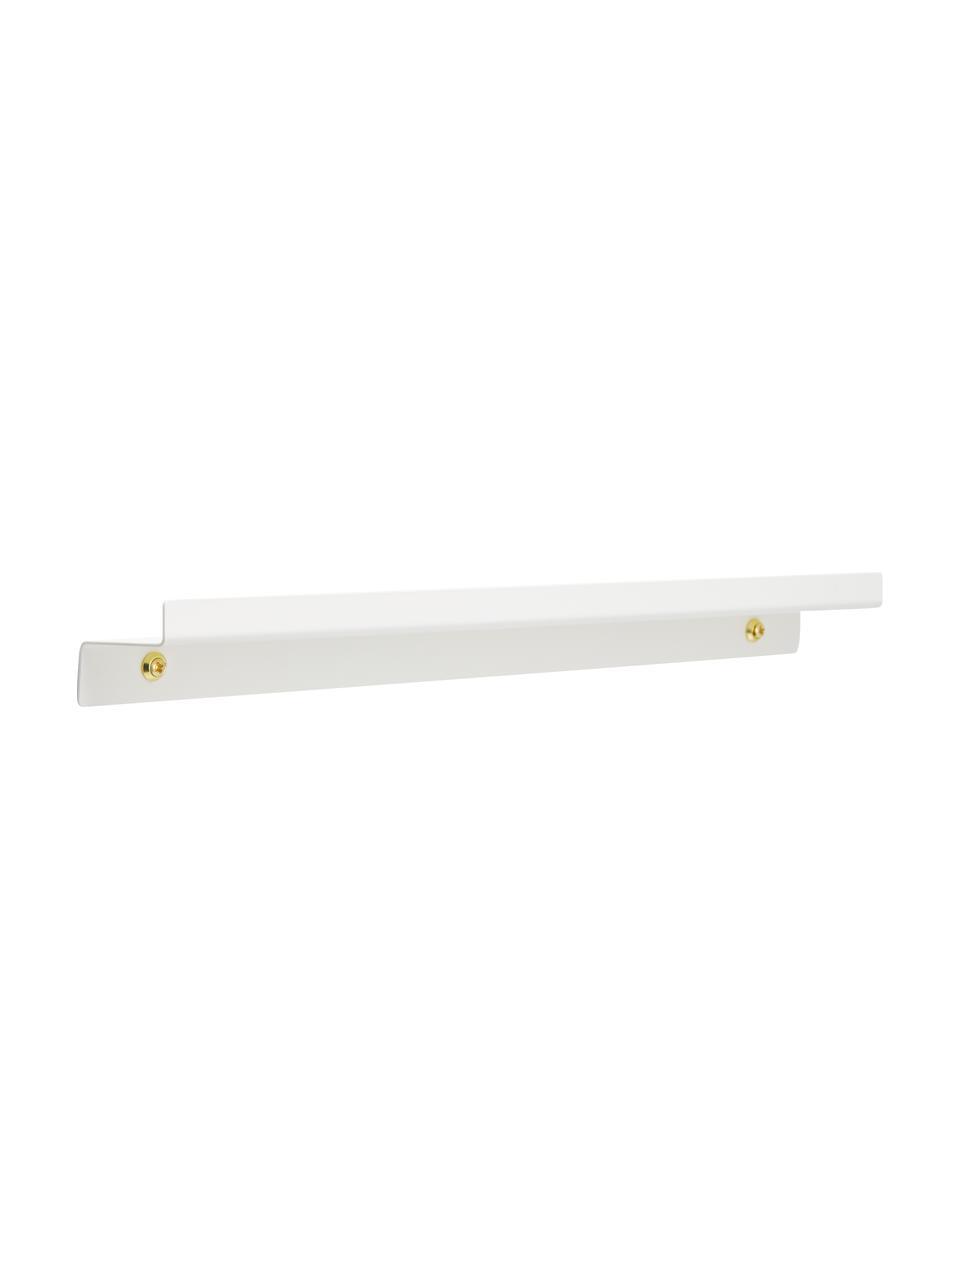 Ripiano bianco opaco Shelfini, Asta: metallo verniciato, Bianco, ottone, Larg. 50 x Alt. 6 cm